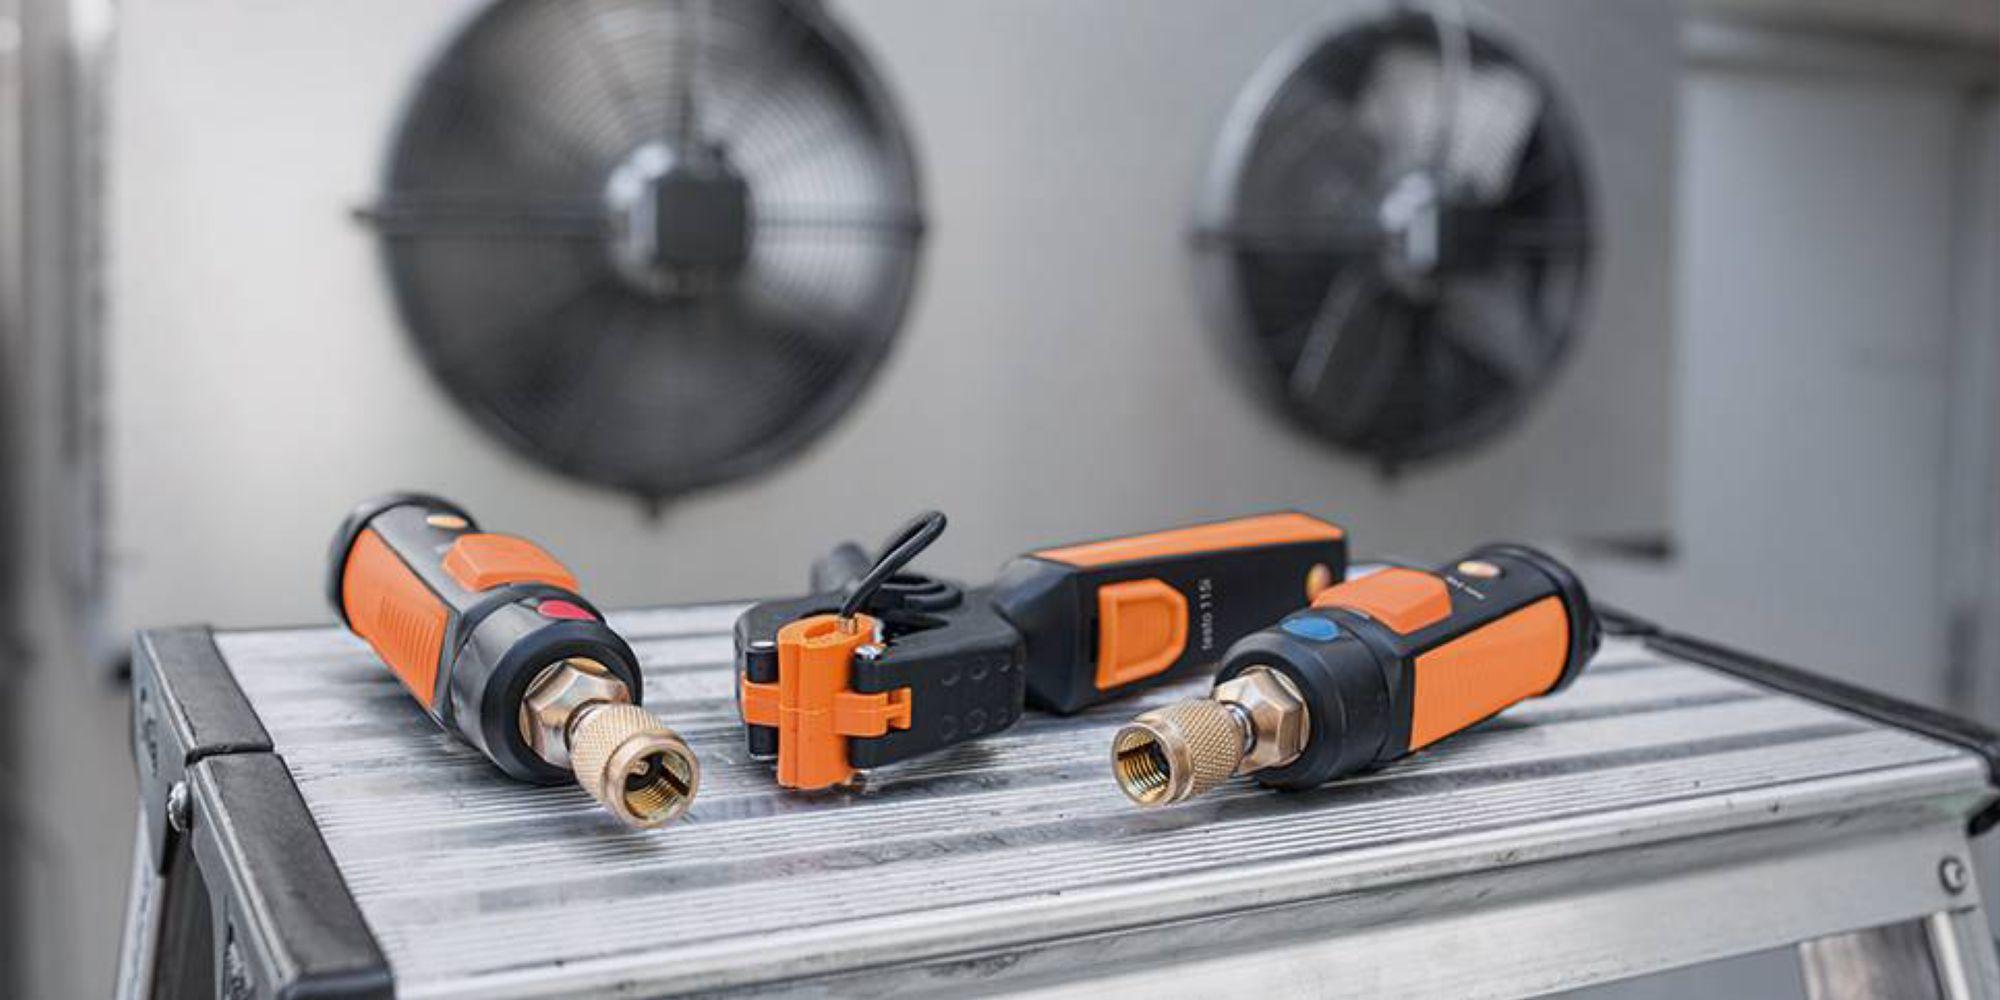 Smart Probe Refrigeration Kit